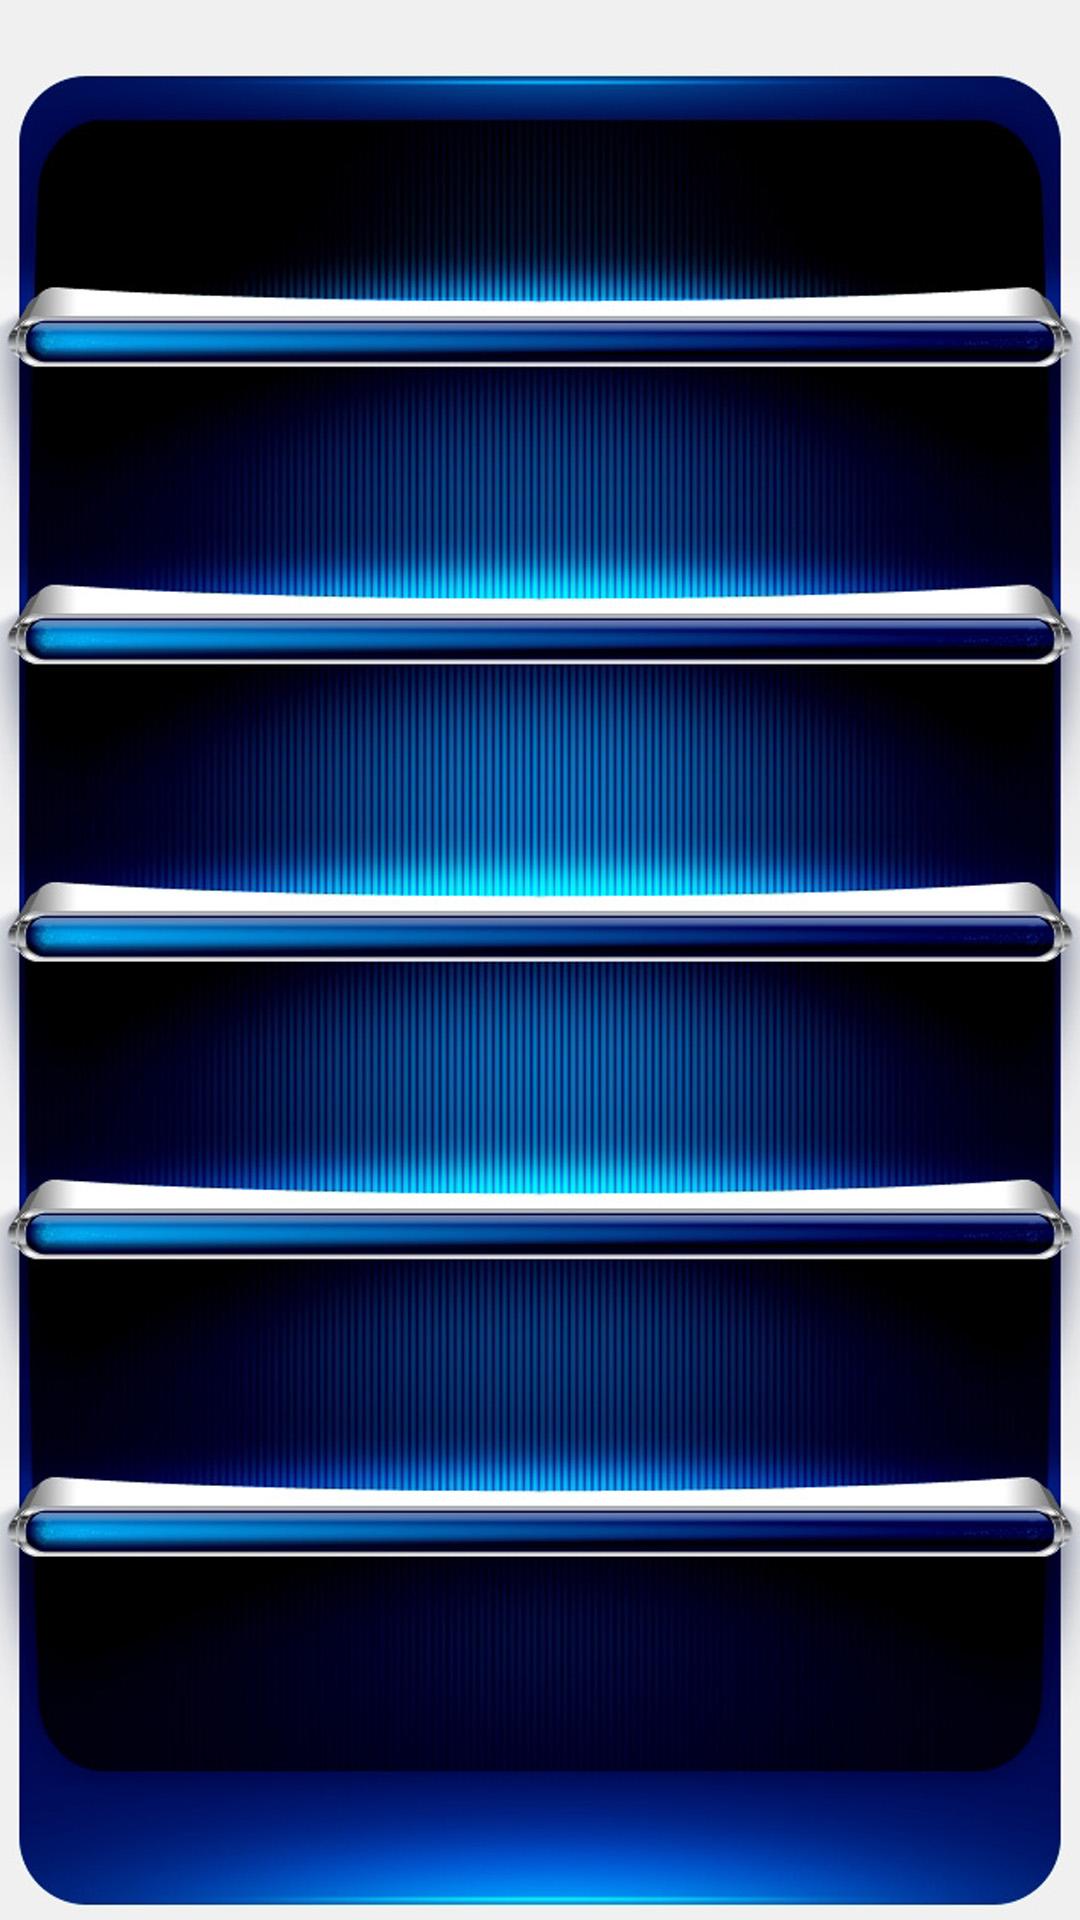 Free Download Sfondo Mensole Iphone 6 Plus 12 Sfondi Iphone